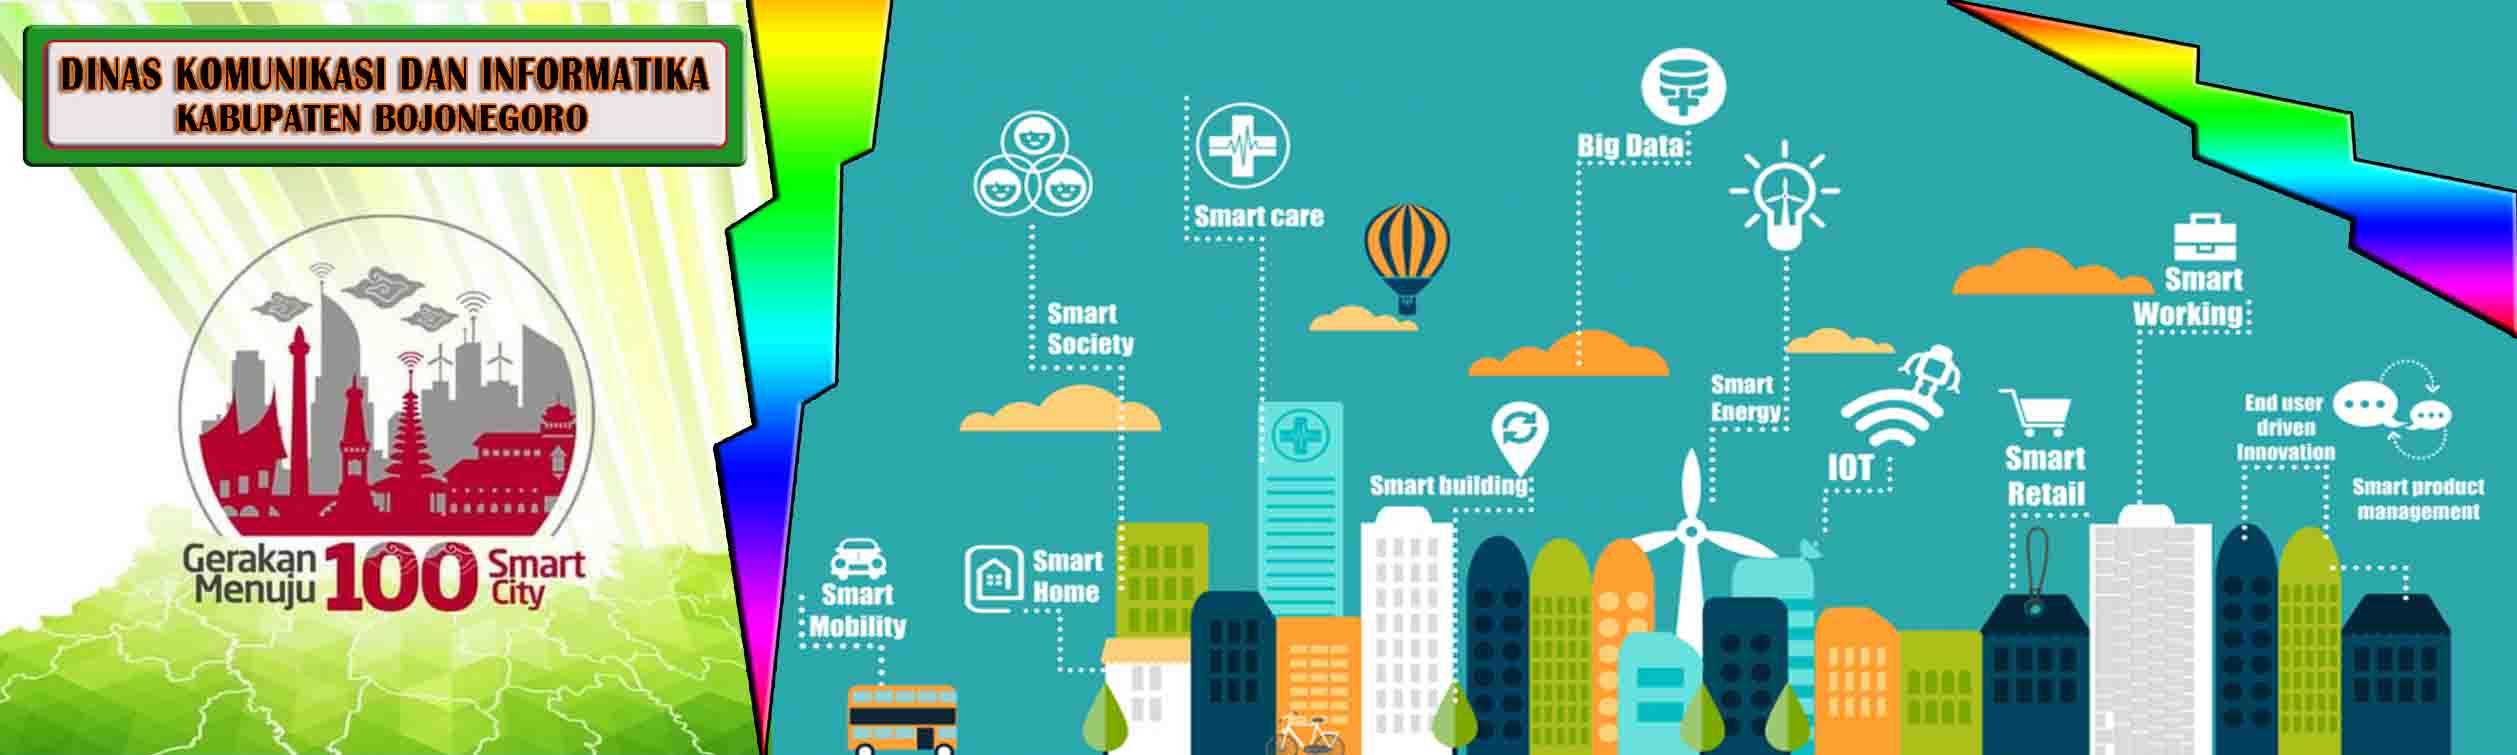 Smart City <BR>Kabupaten Bojonegoro